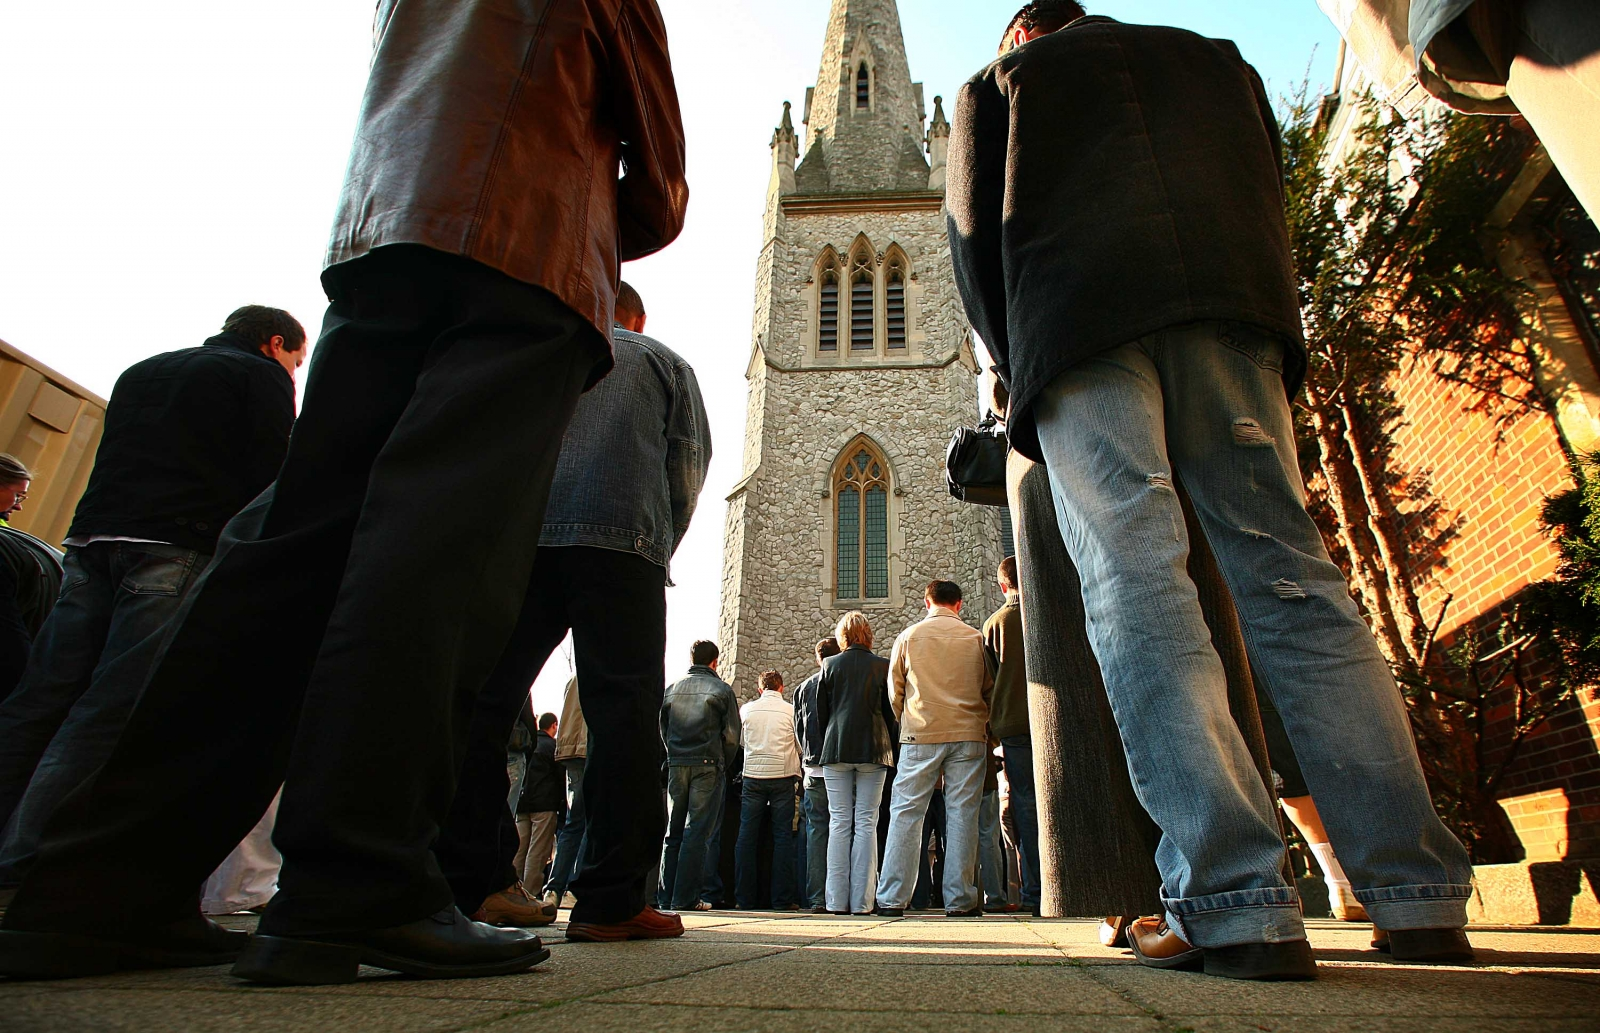 Church and the EU referendum